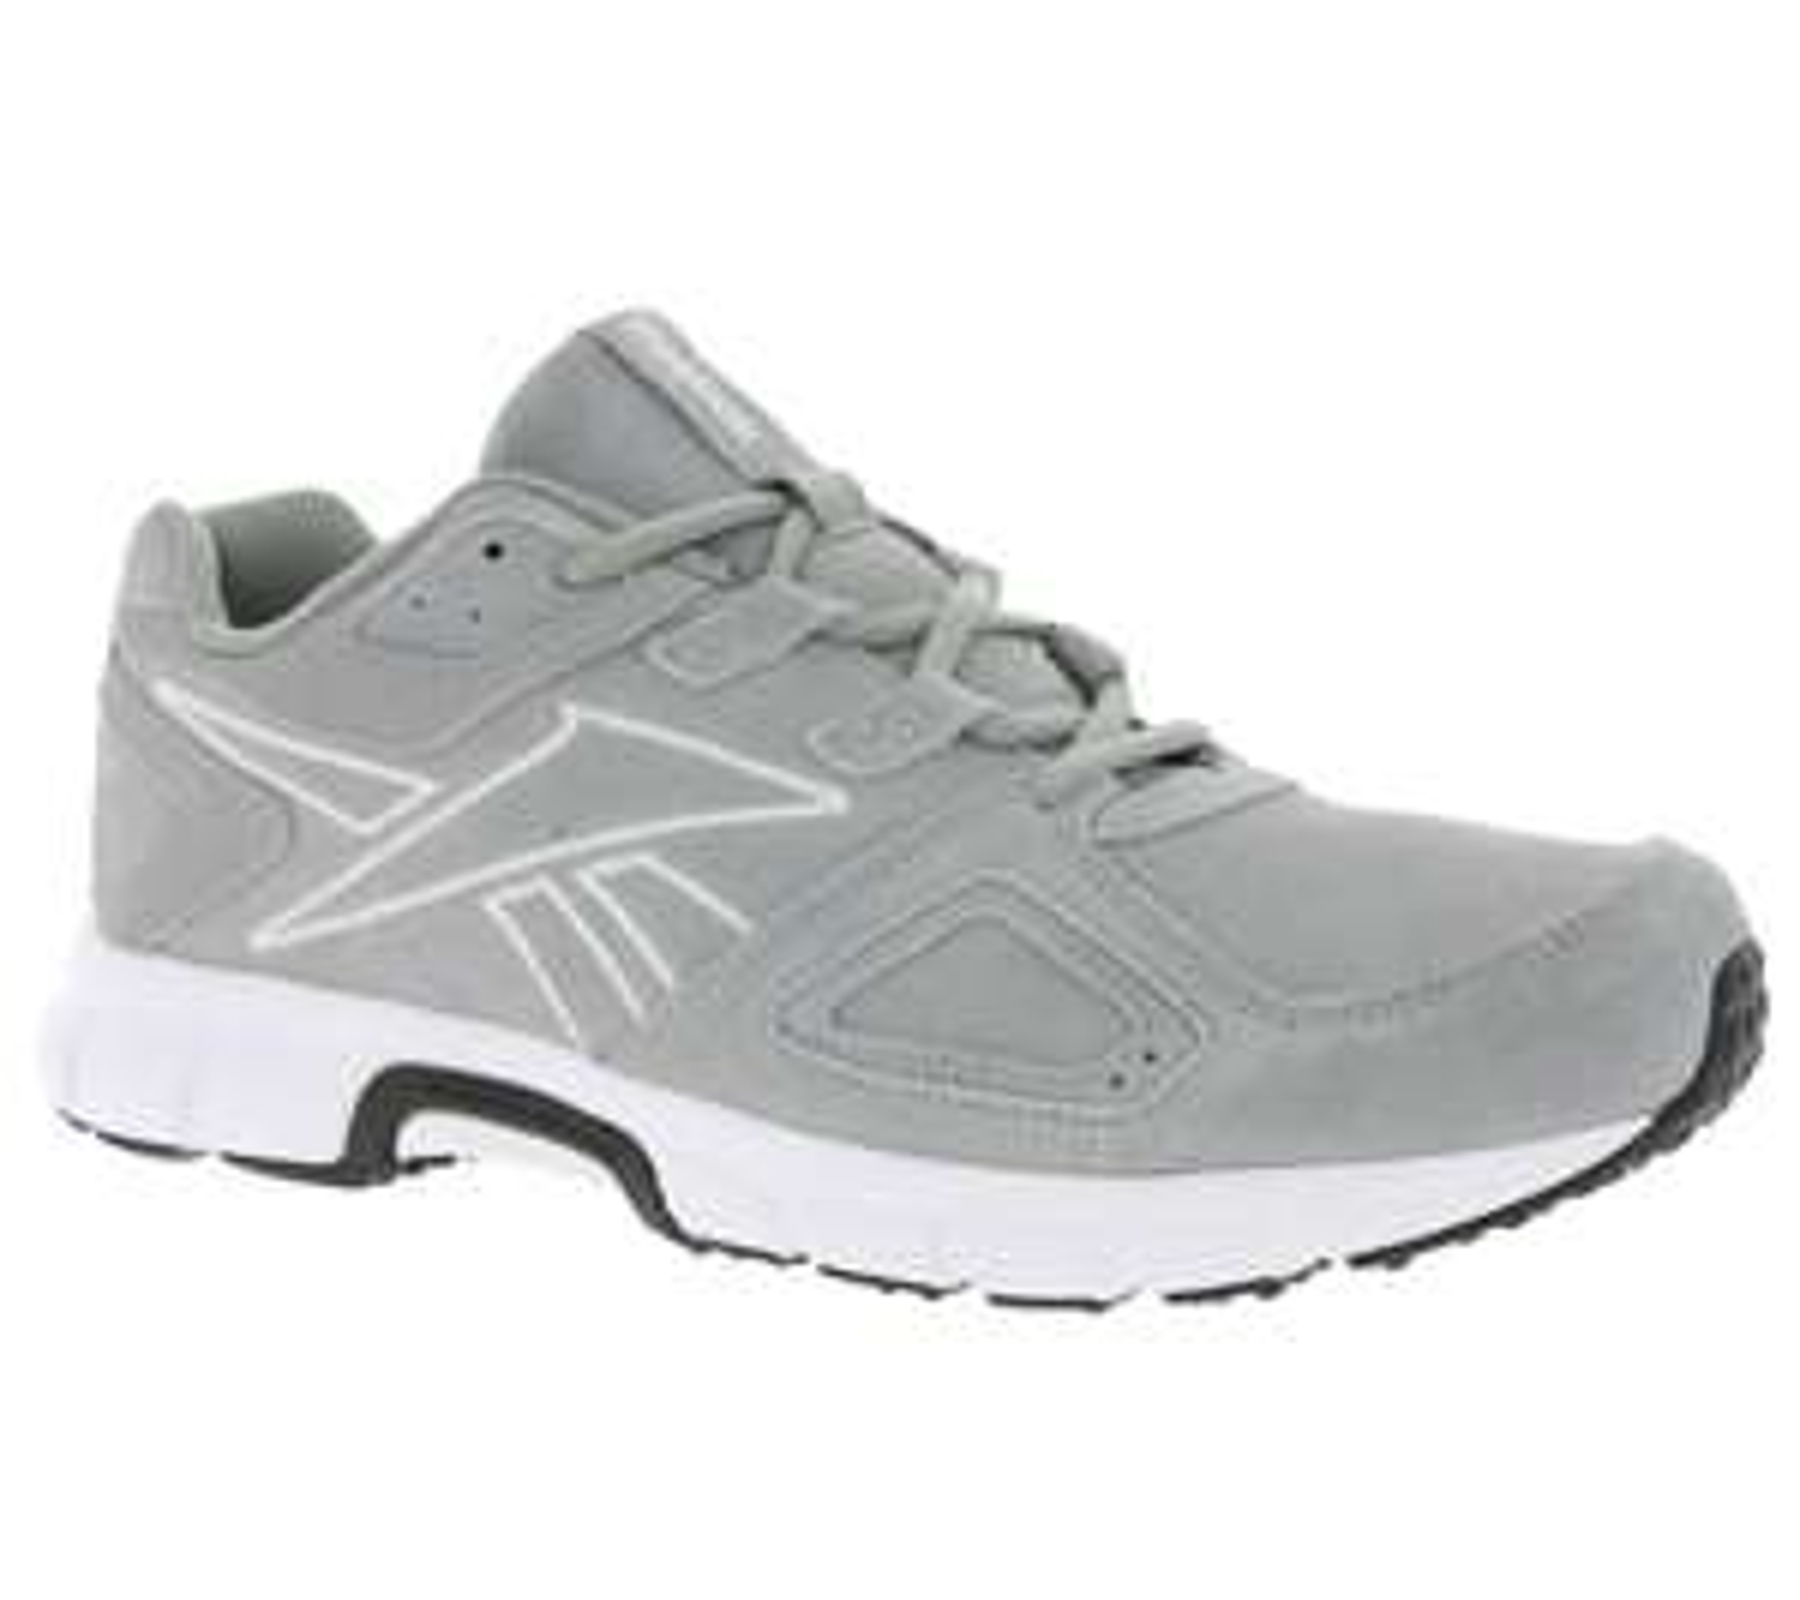 Chaussures grises Reebok Versa Train 2.0 - Grise (Taille 40 à 47)